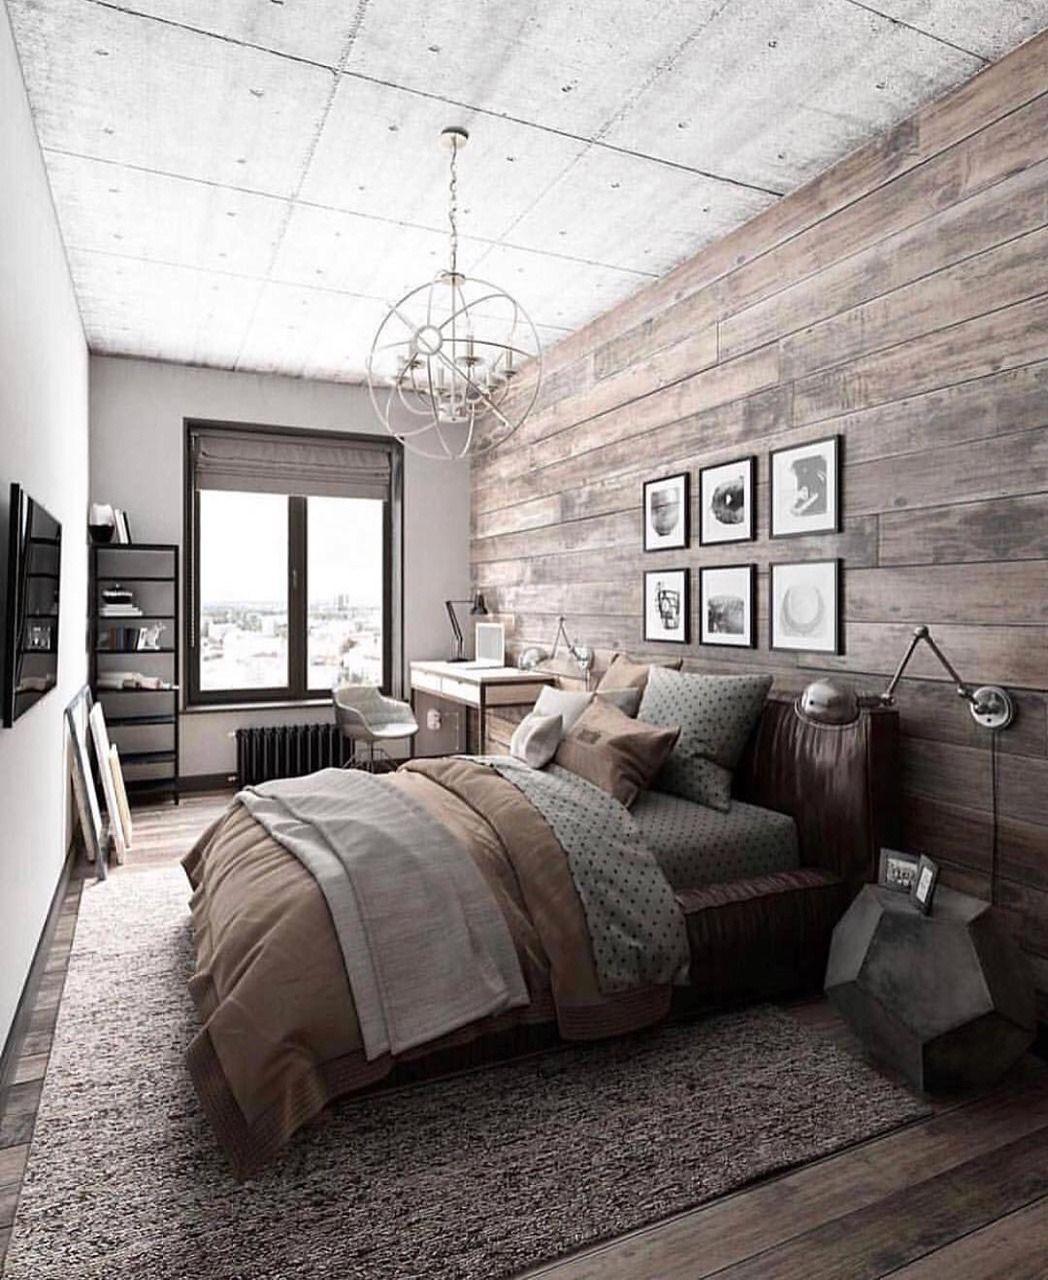 Home-office-schlafzimmer-design-ideen bedroom inspiration  wood wall  goalz  pinterest  bedroom